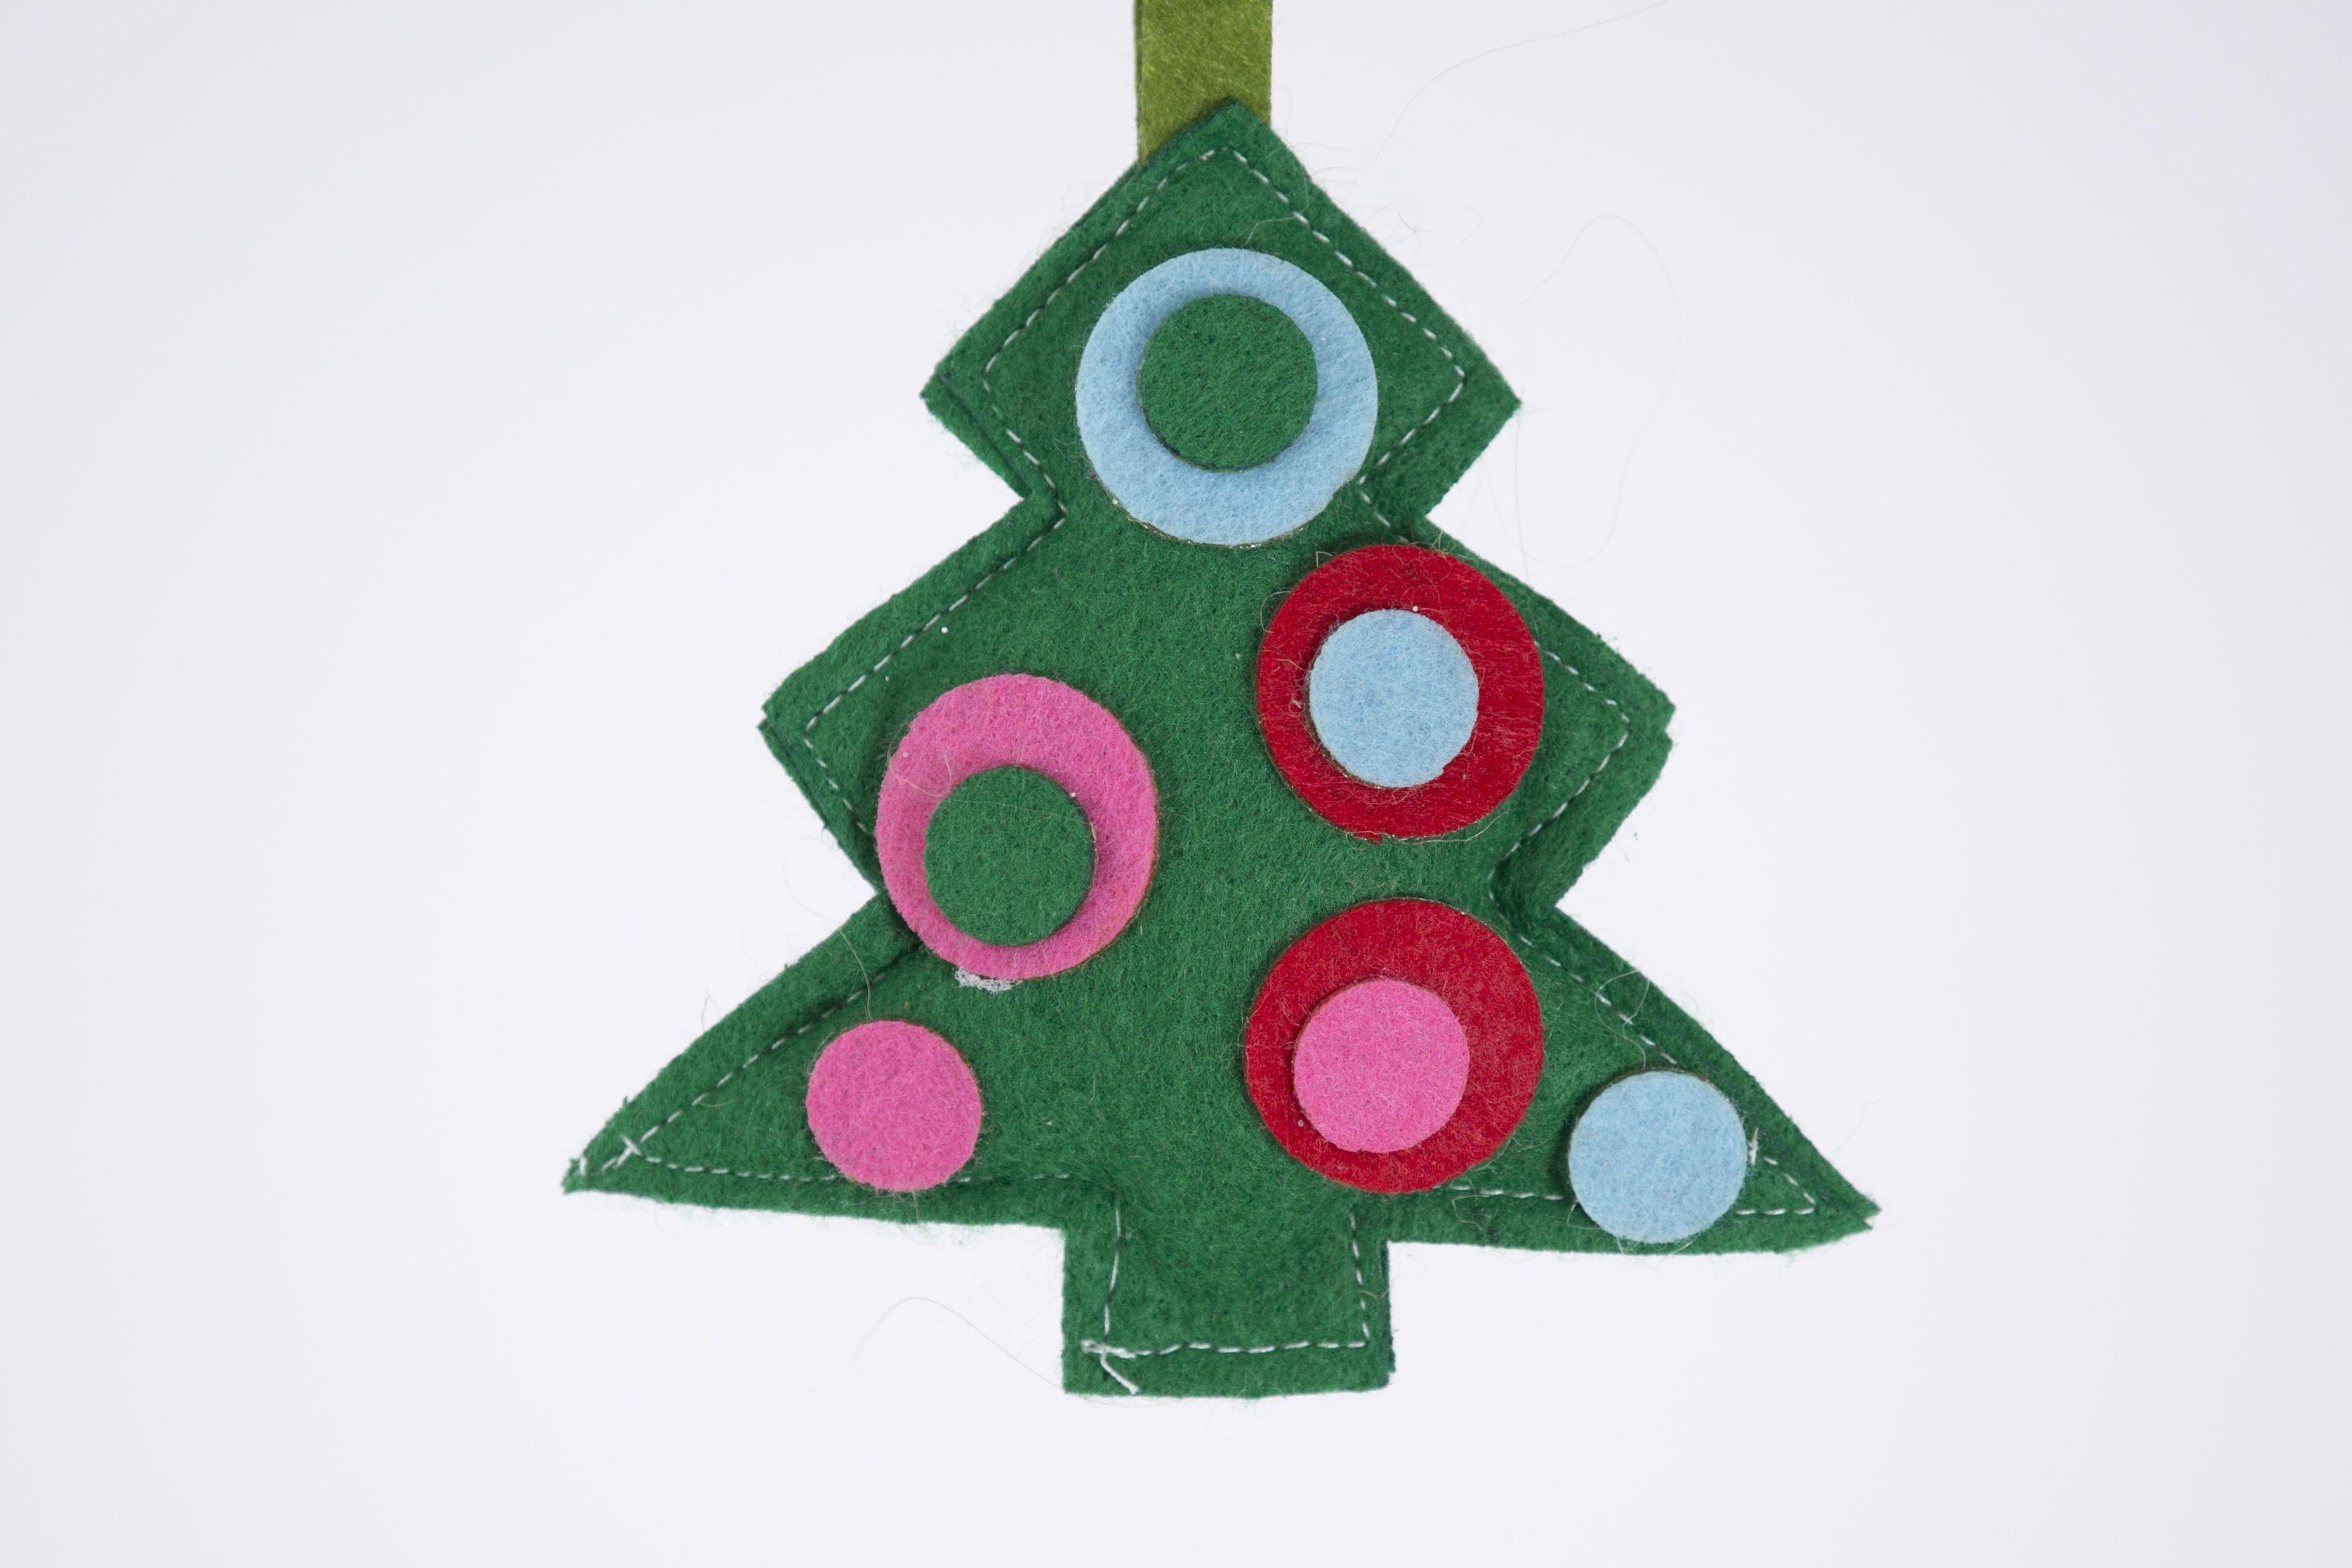 Felt Christmas Tree Ornament Felt Christmas Ornament Etsy Christmas Tree Ornaments Felt Felt Crafts Kits Felt Christmas Ornaments